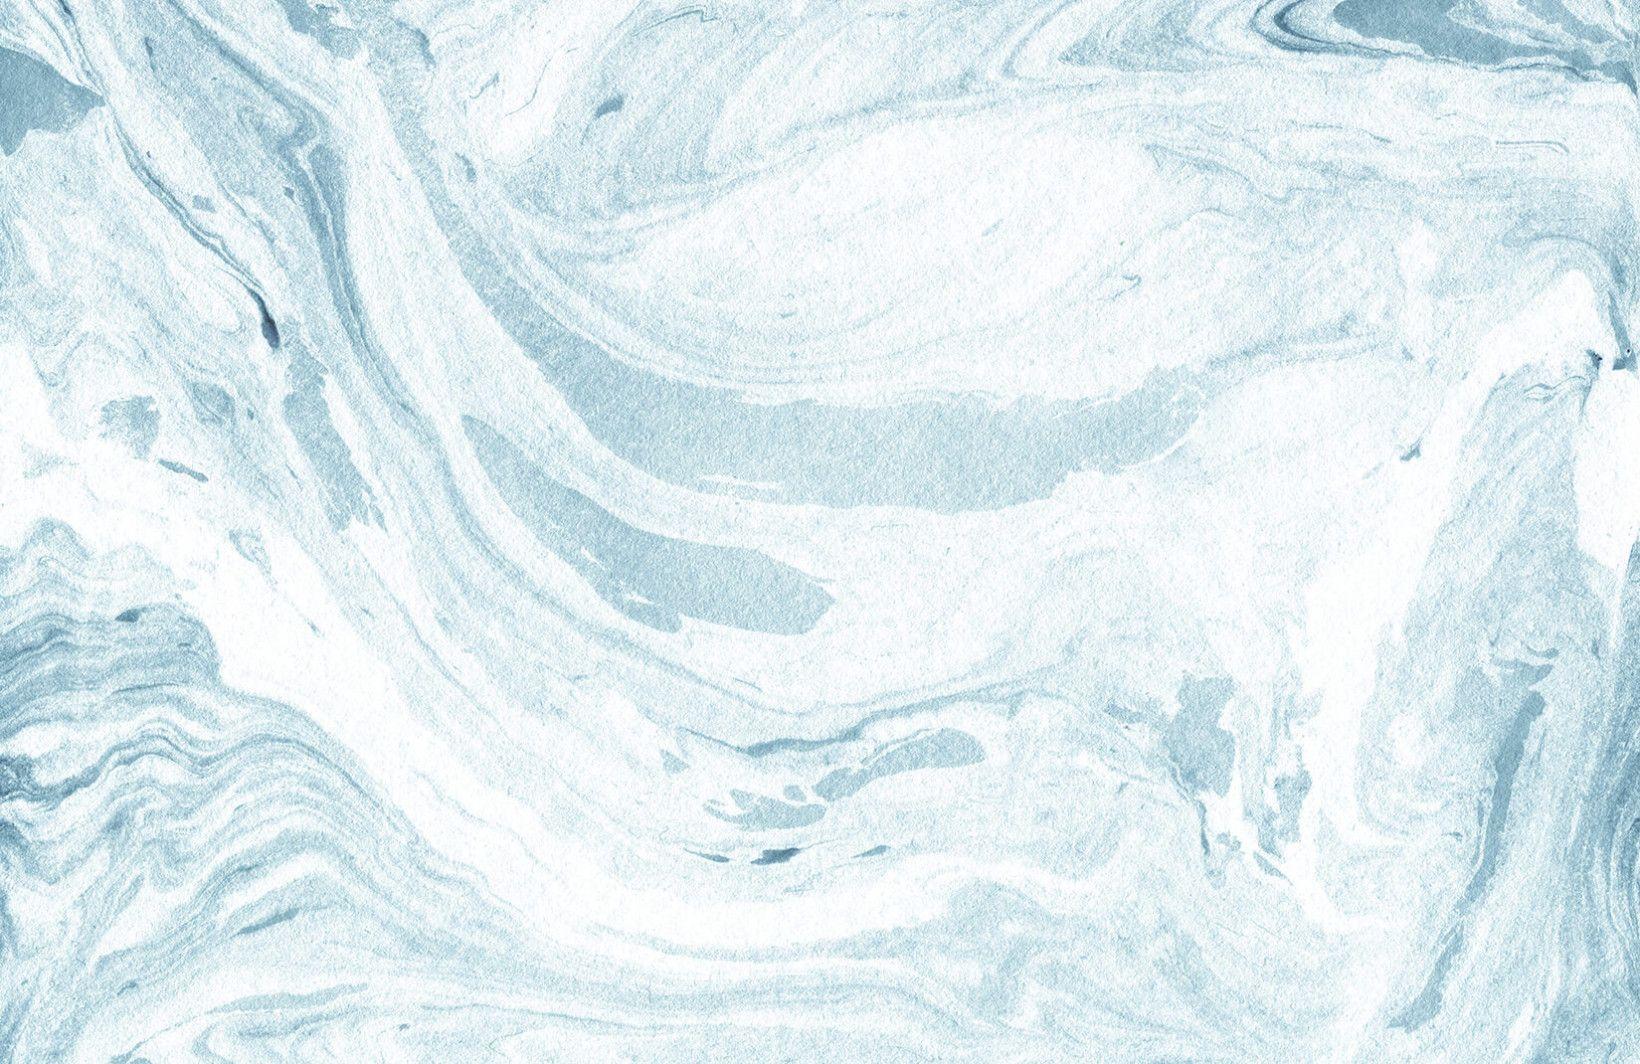 Blue And White Marbleized Wallpaper Mural Murals Wallpaper Blue Marble Wallpaper Marble Desktop Wallpaper Aesthetic Desktop Wallpaper